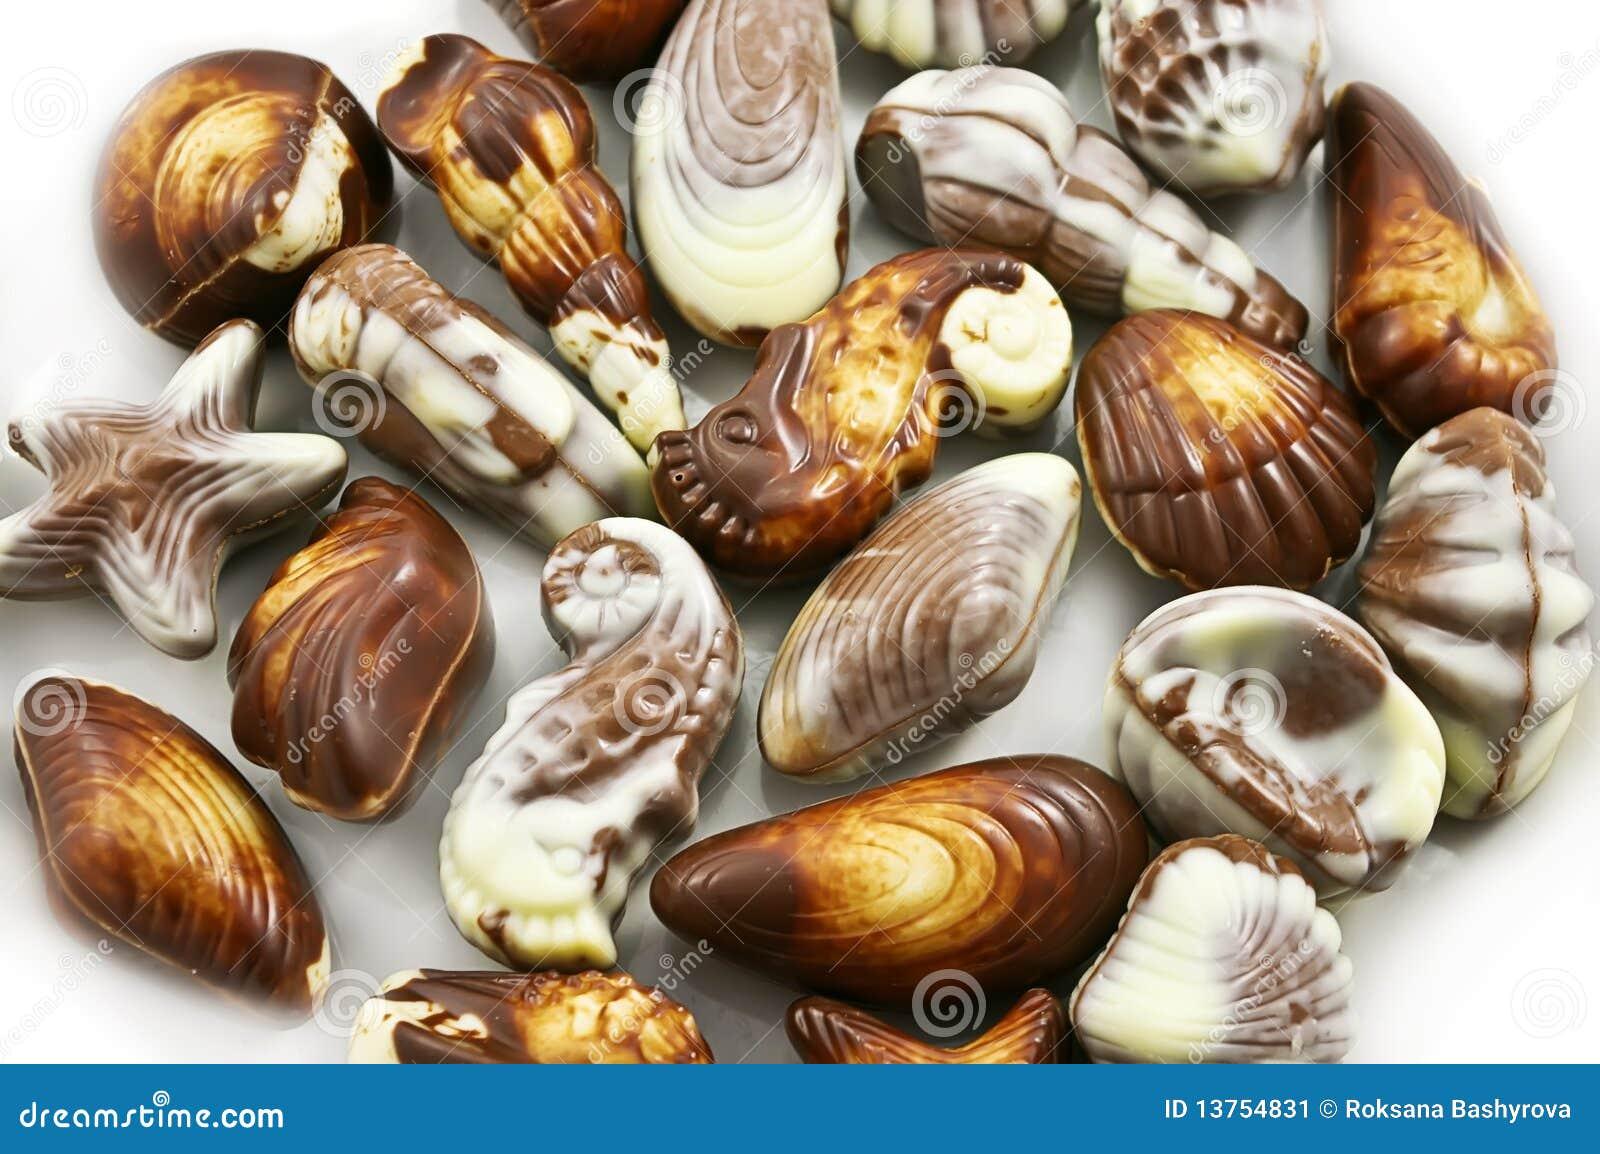 Various Kinds Of Chocolate Seashells Stock Image - Image: 13754831